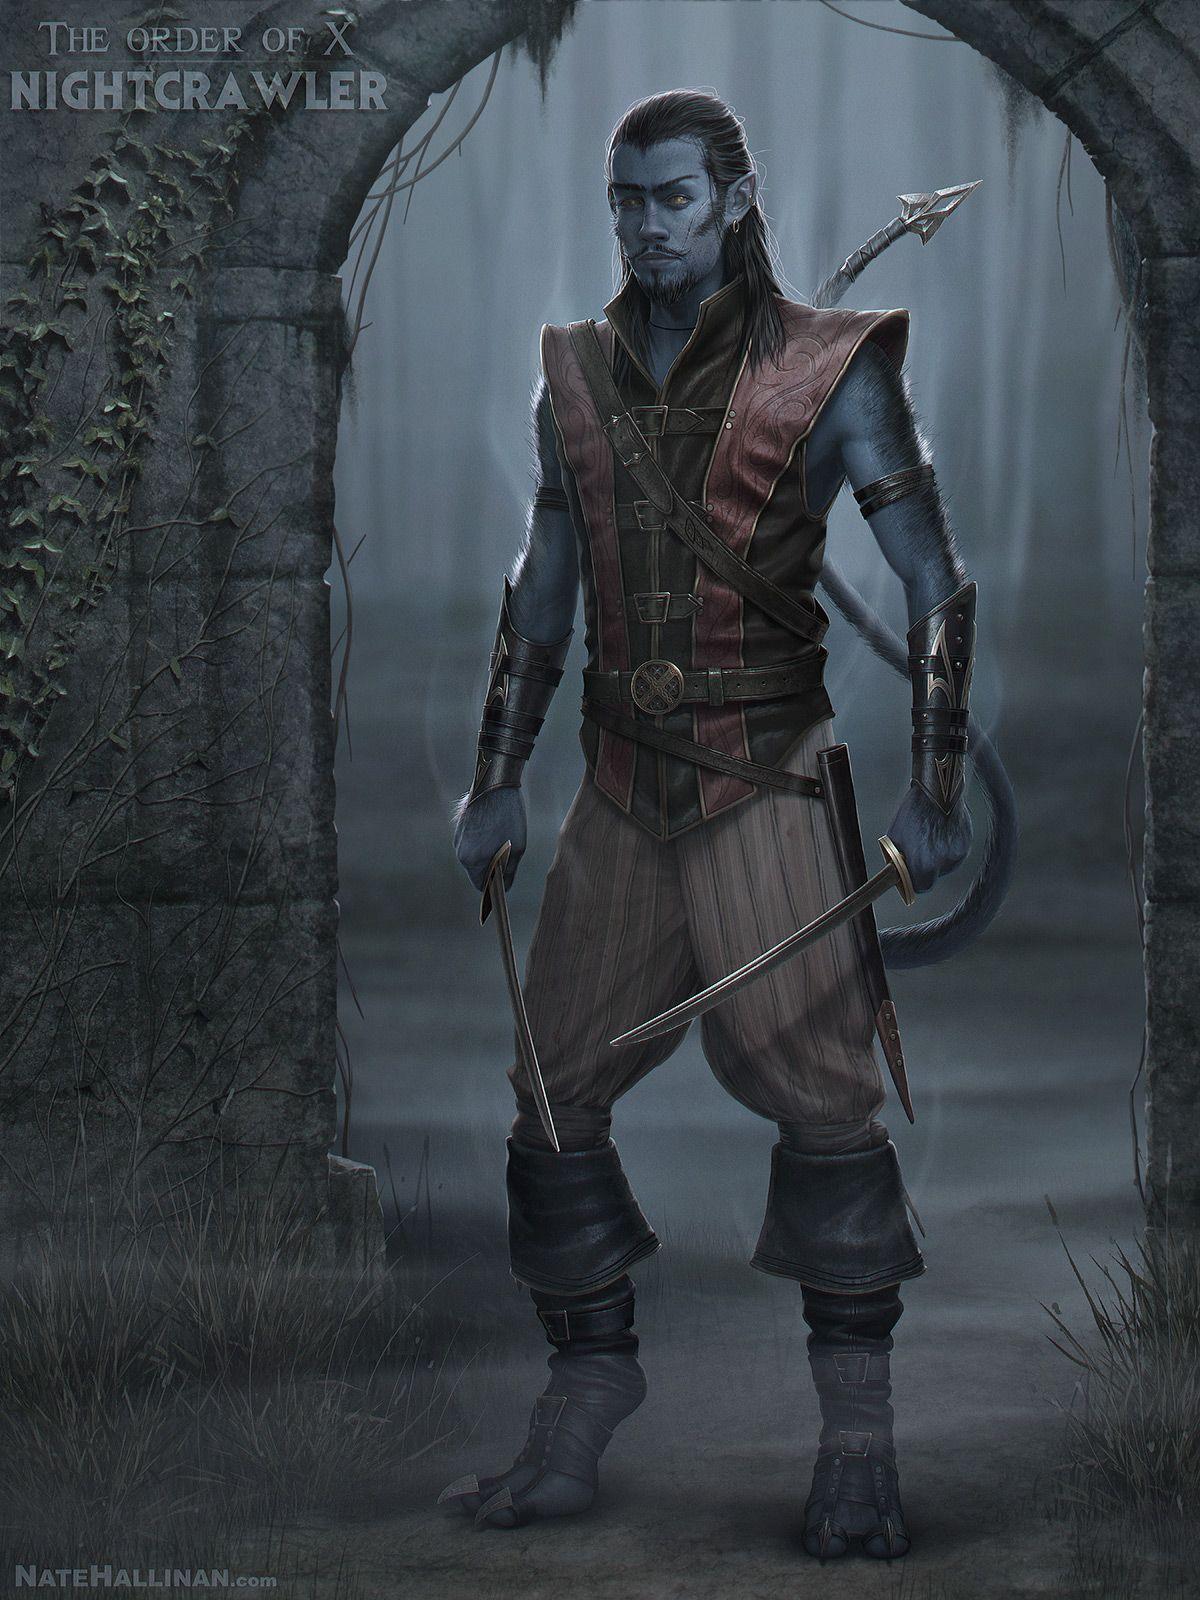 Medieval Nightcrawler, Rogue, Thief, Assassin, x-men, RPG ...